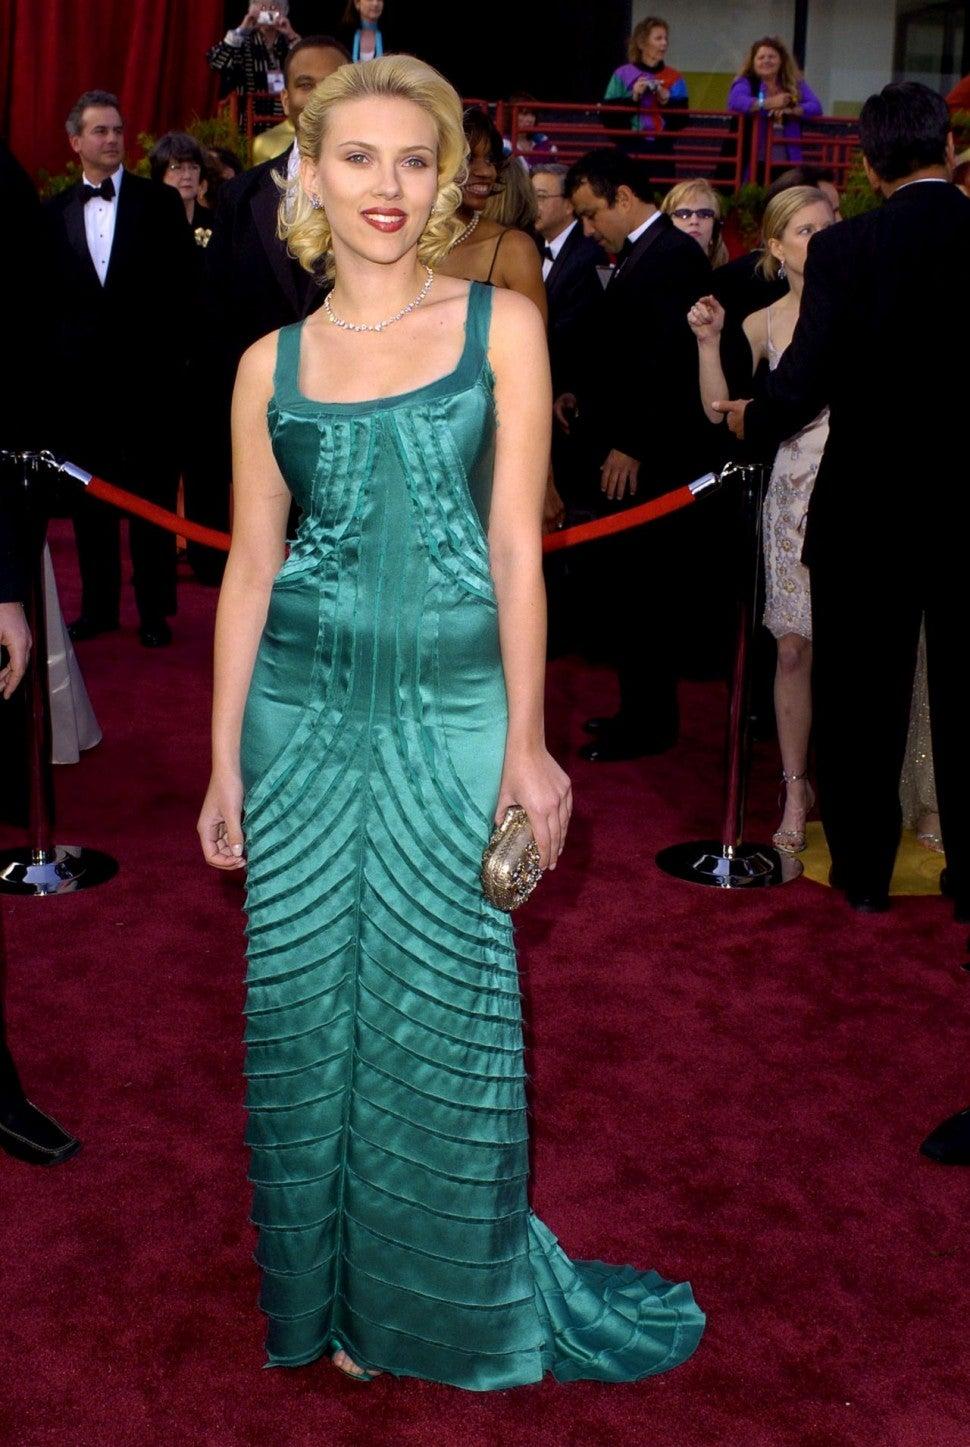 Scarlett Johansson 2004 Oscars